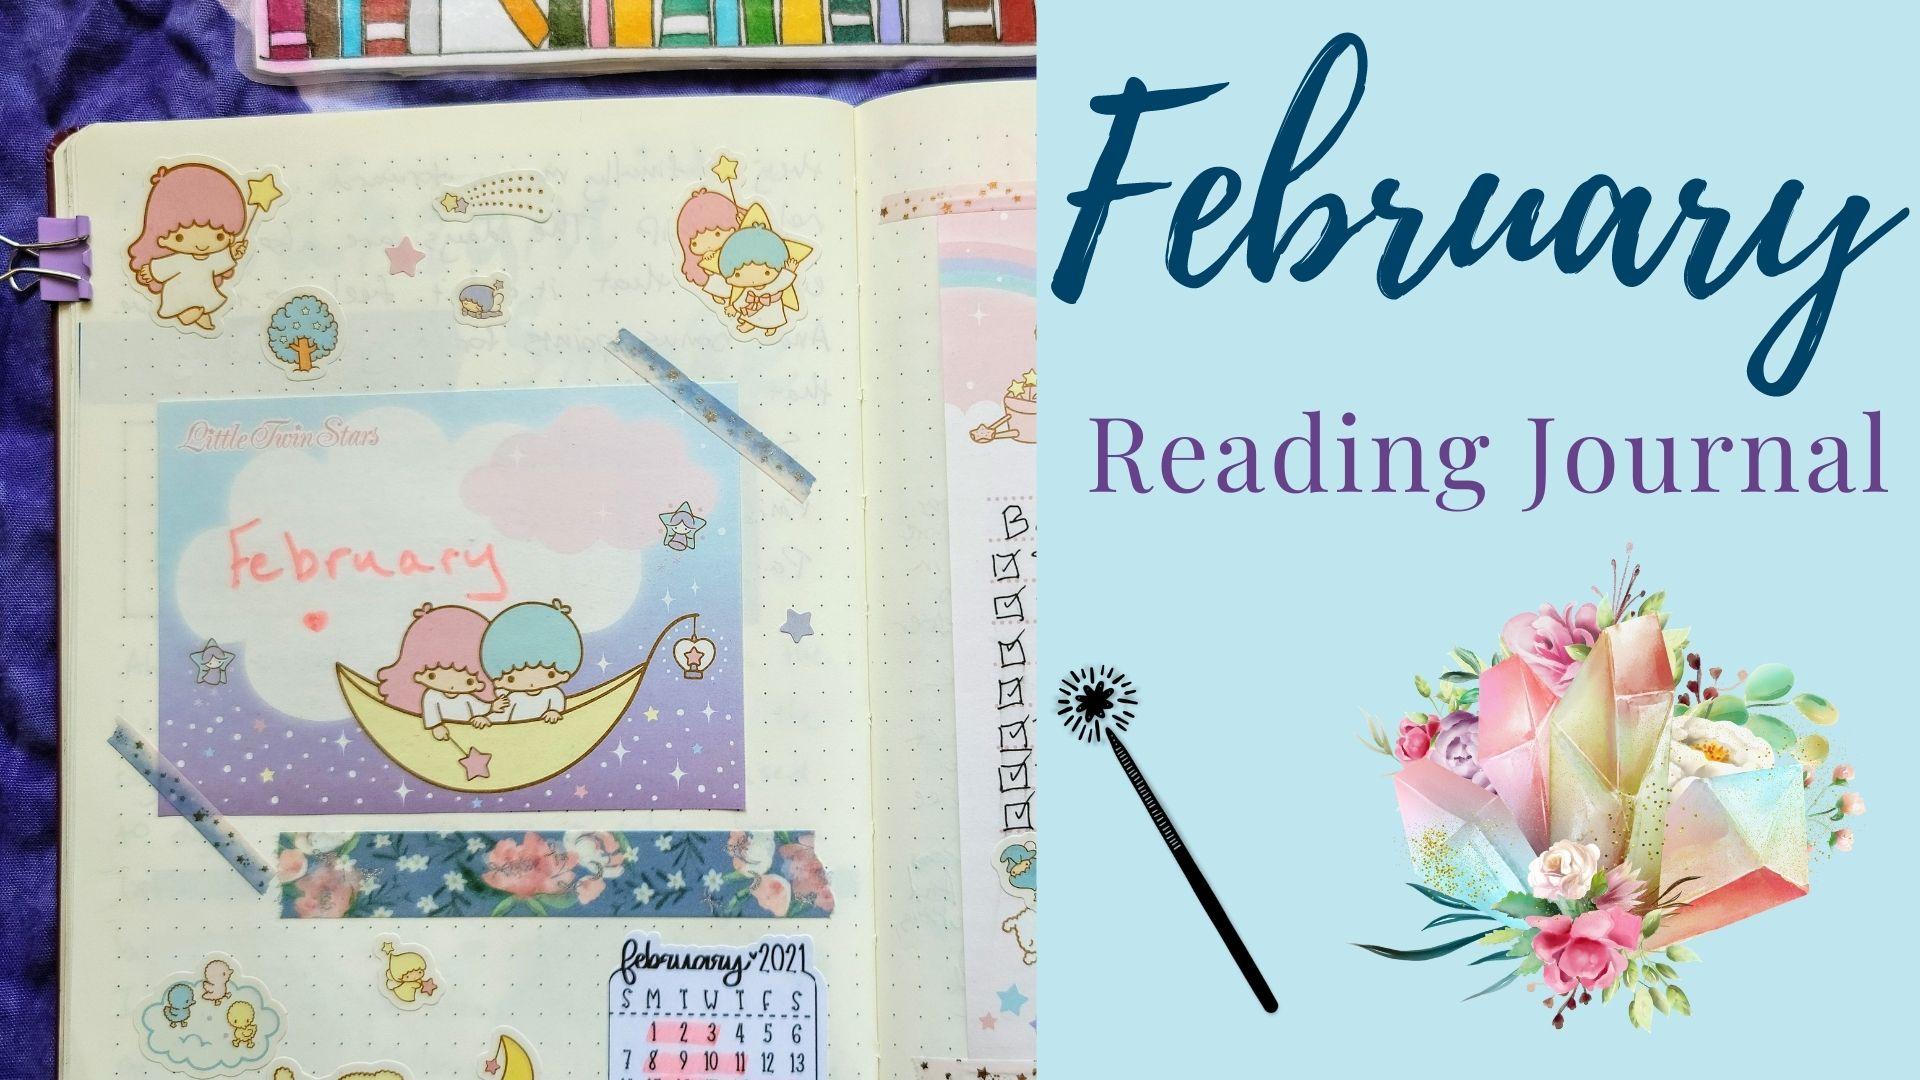 February Reading Journal: Little Twin Stars